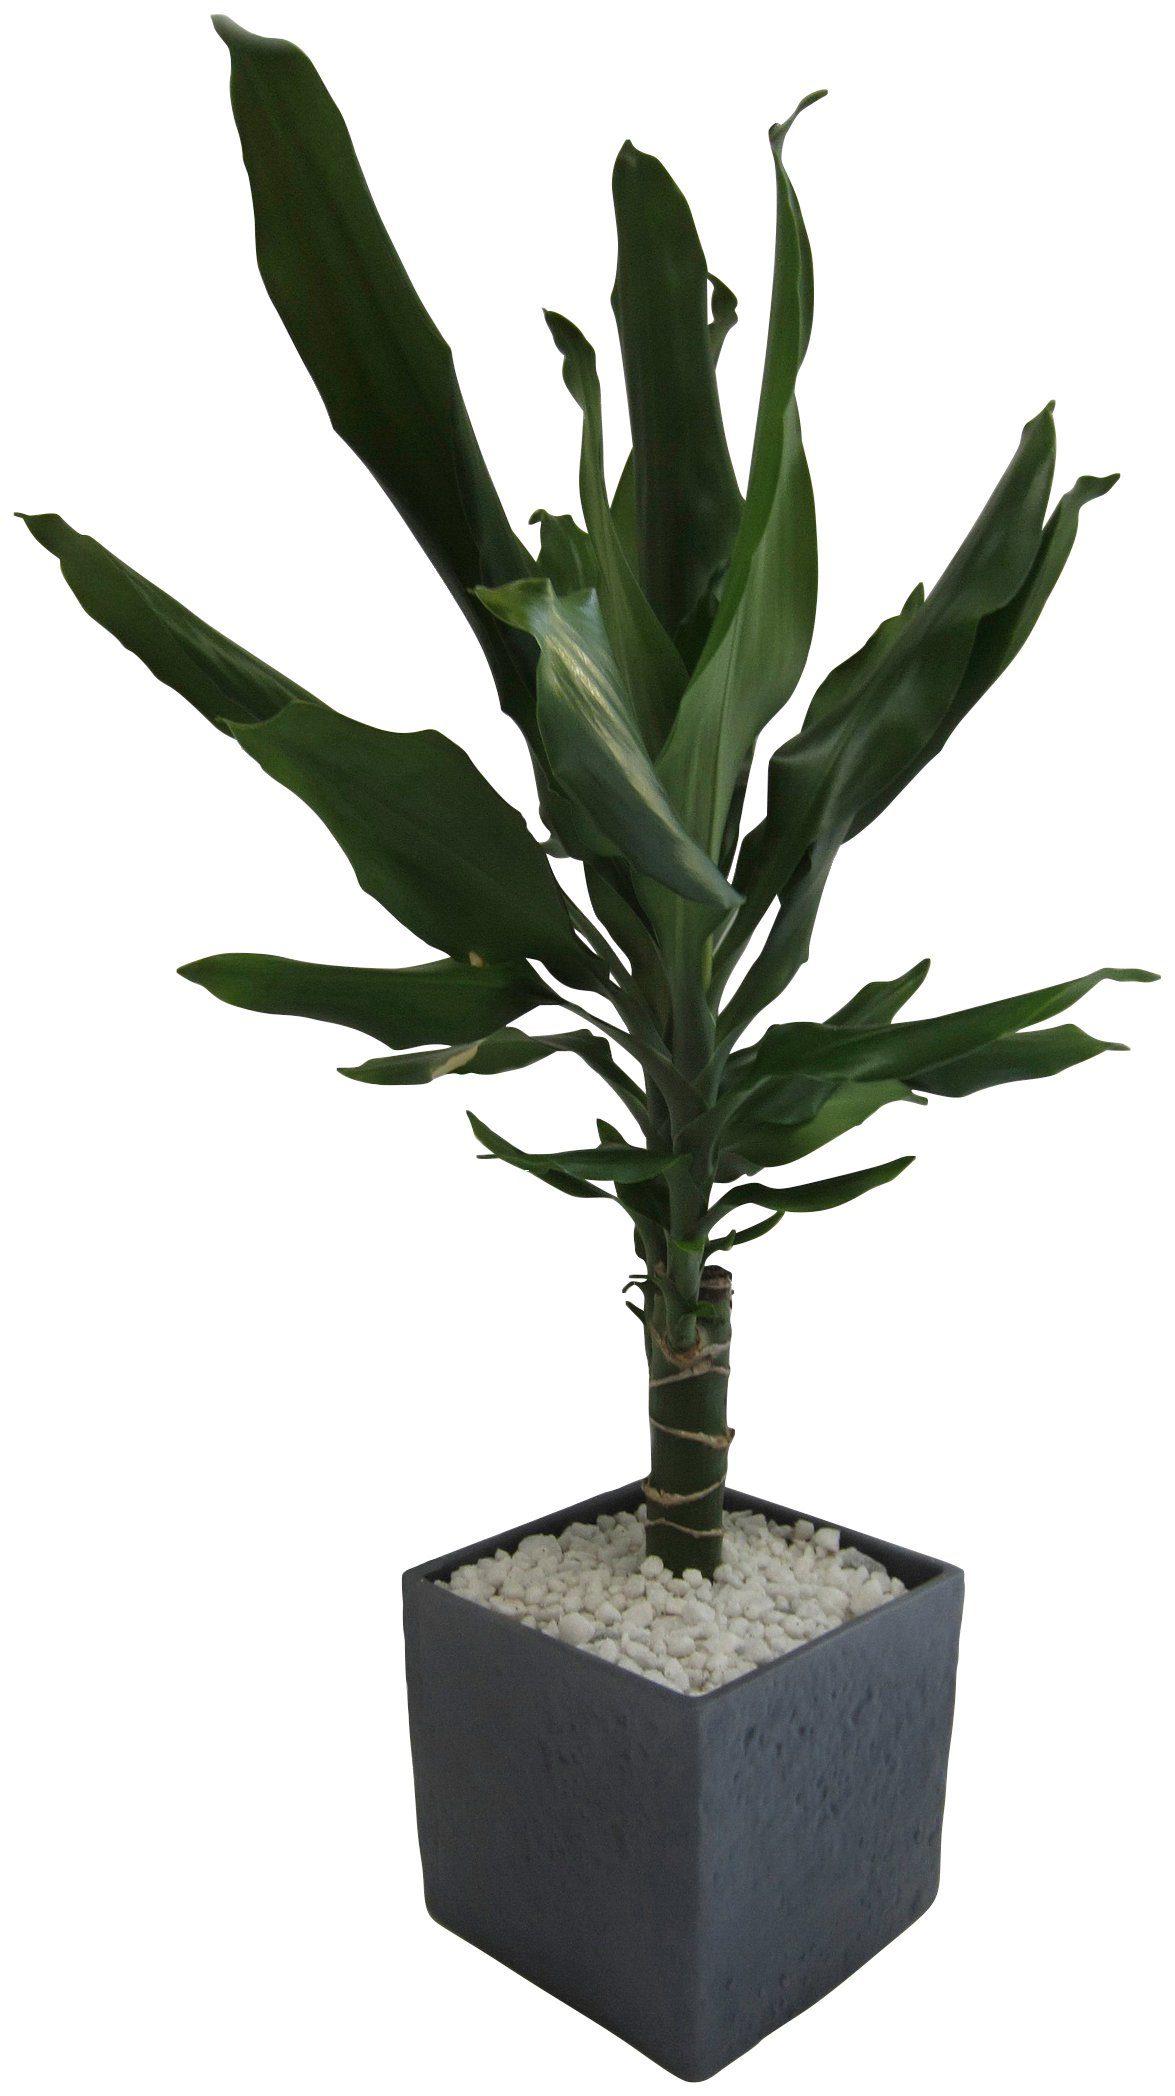 DOMINIK Zimmerpflanze »Drazene«, Höhe: 30 cm, 1 Pflanze im Dekotopf